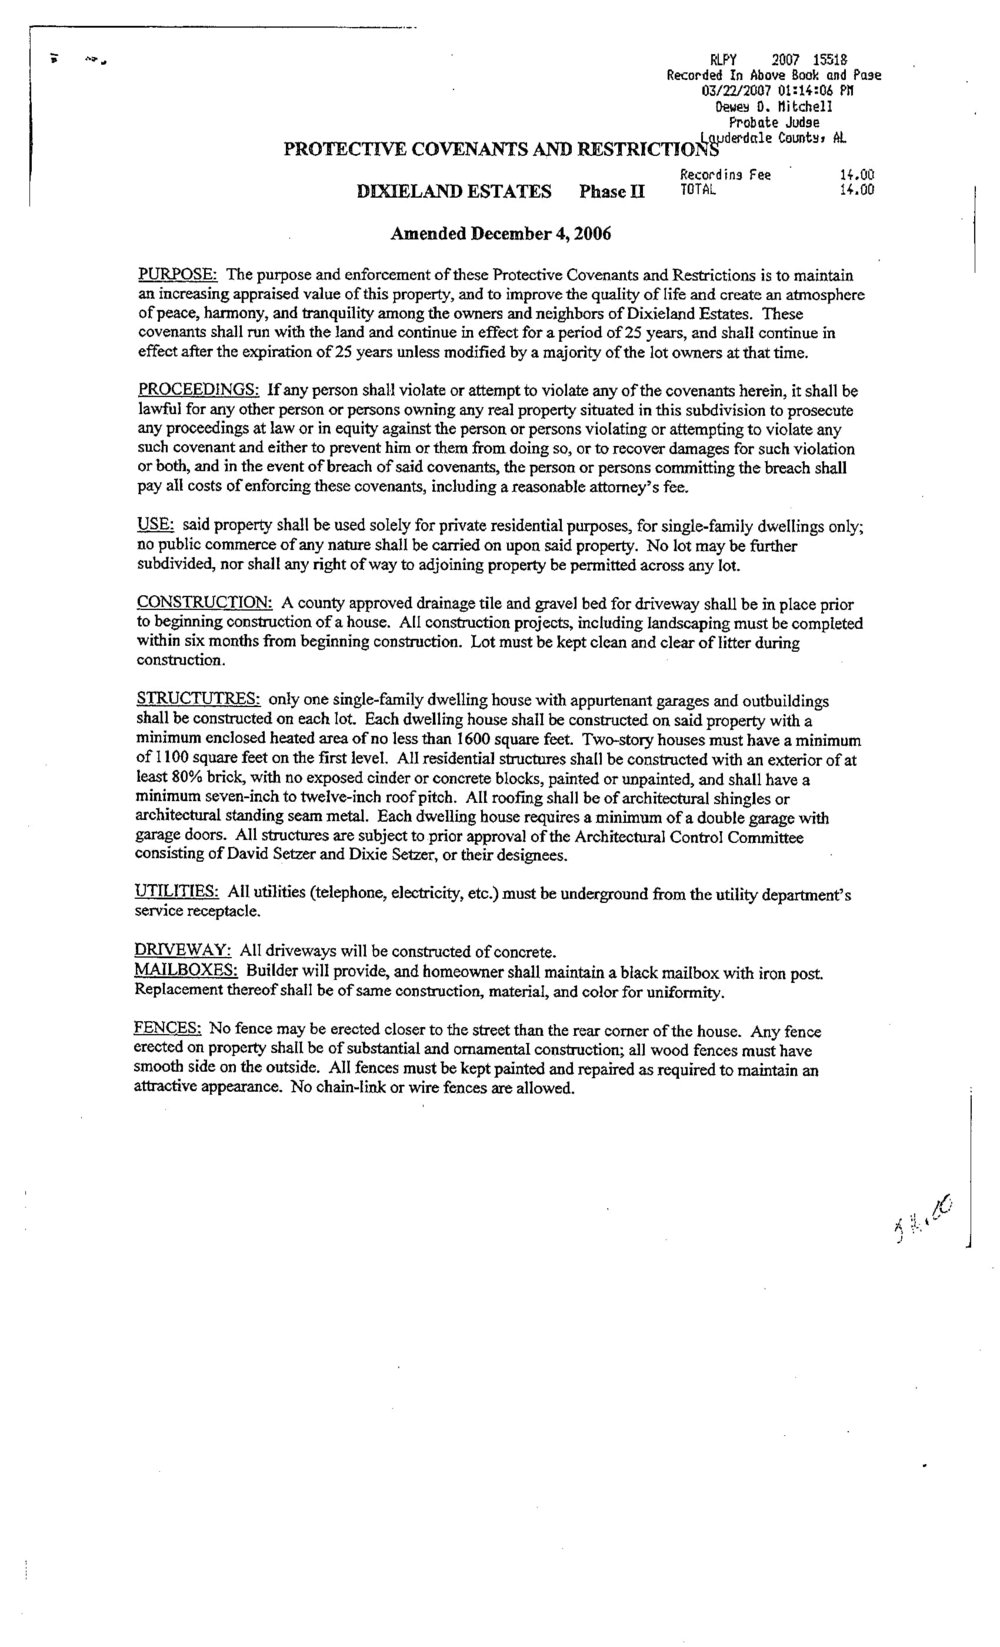 dixieland estates- phase 2- covenants-5.jpg